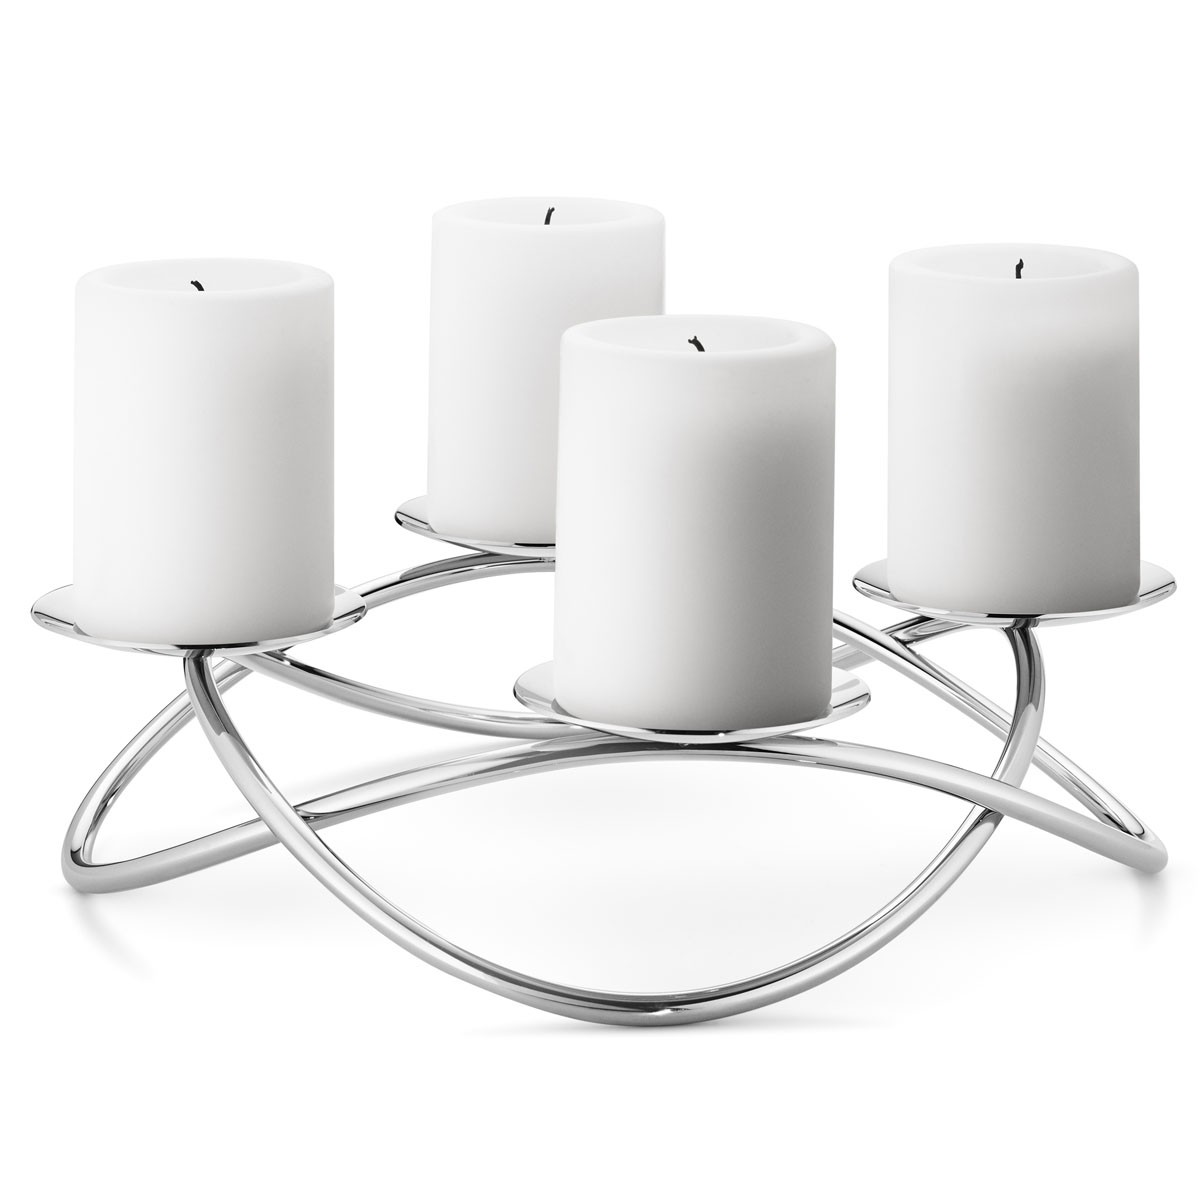 georg jensen season edelstahl kerzenhalter gl nzend d 31 5. Black Bedroom Furniture Sets. Home Design Ideas